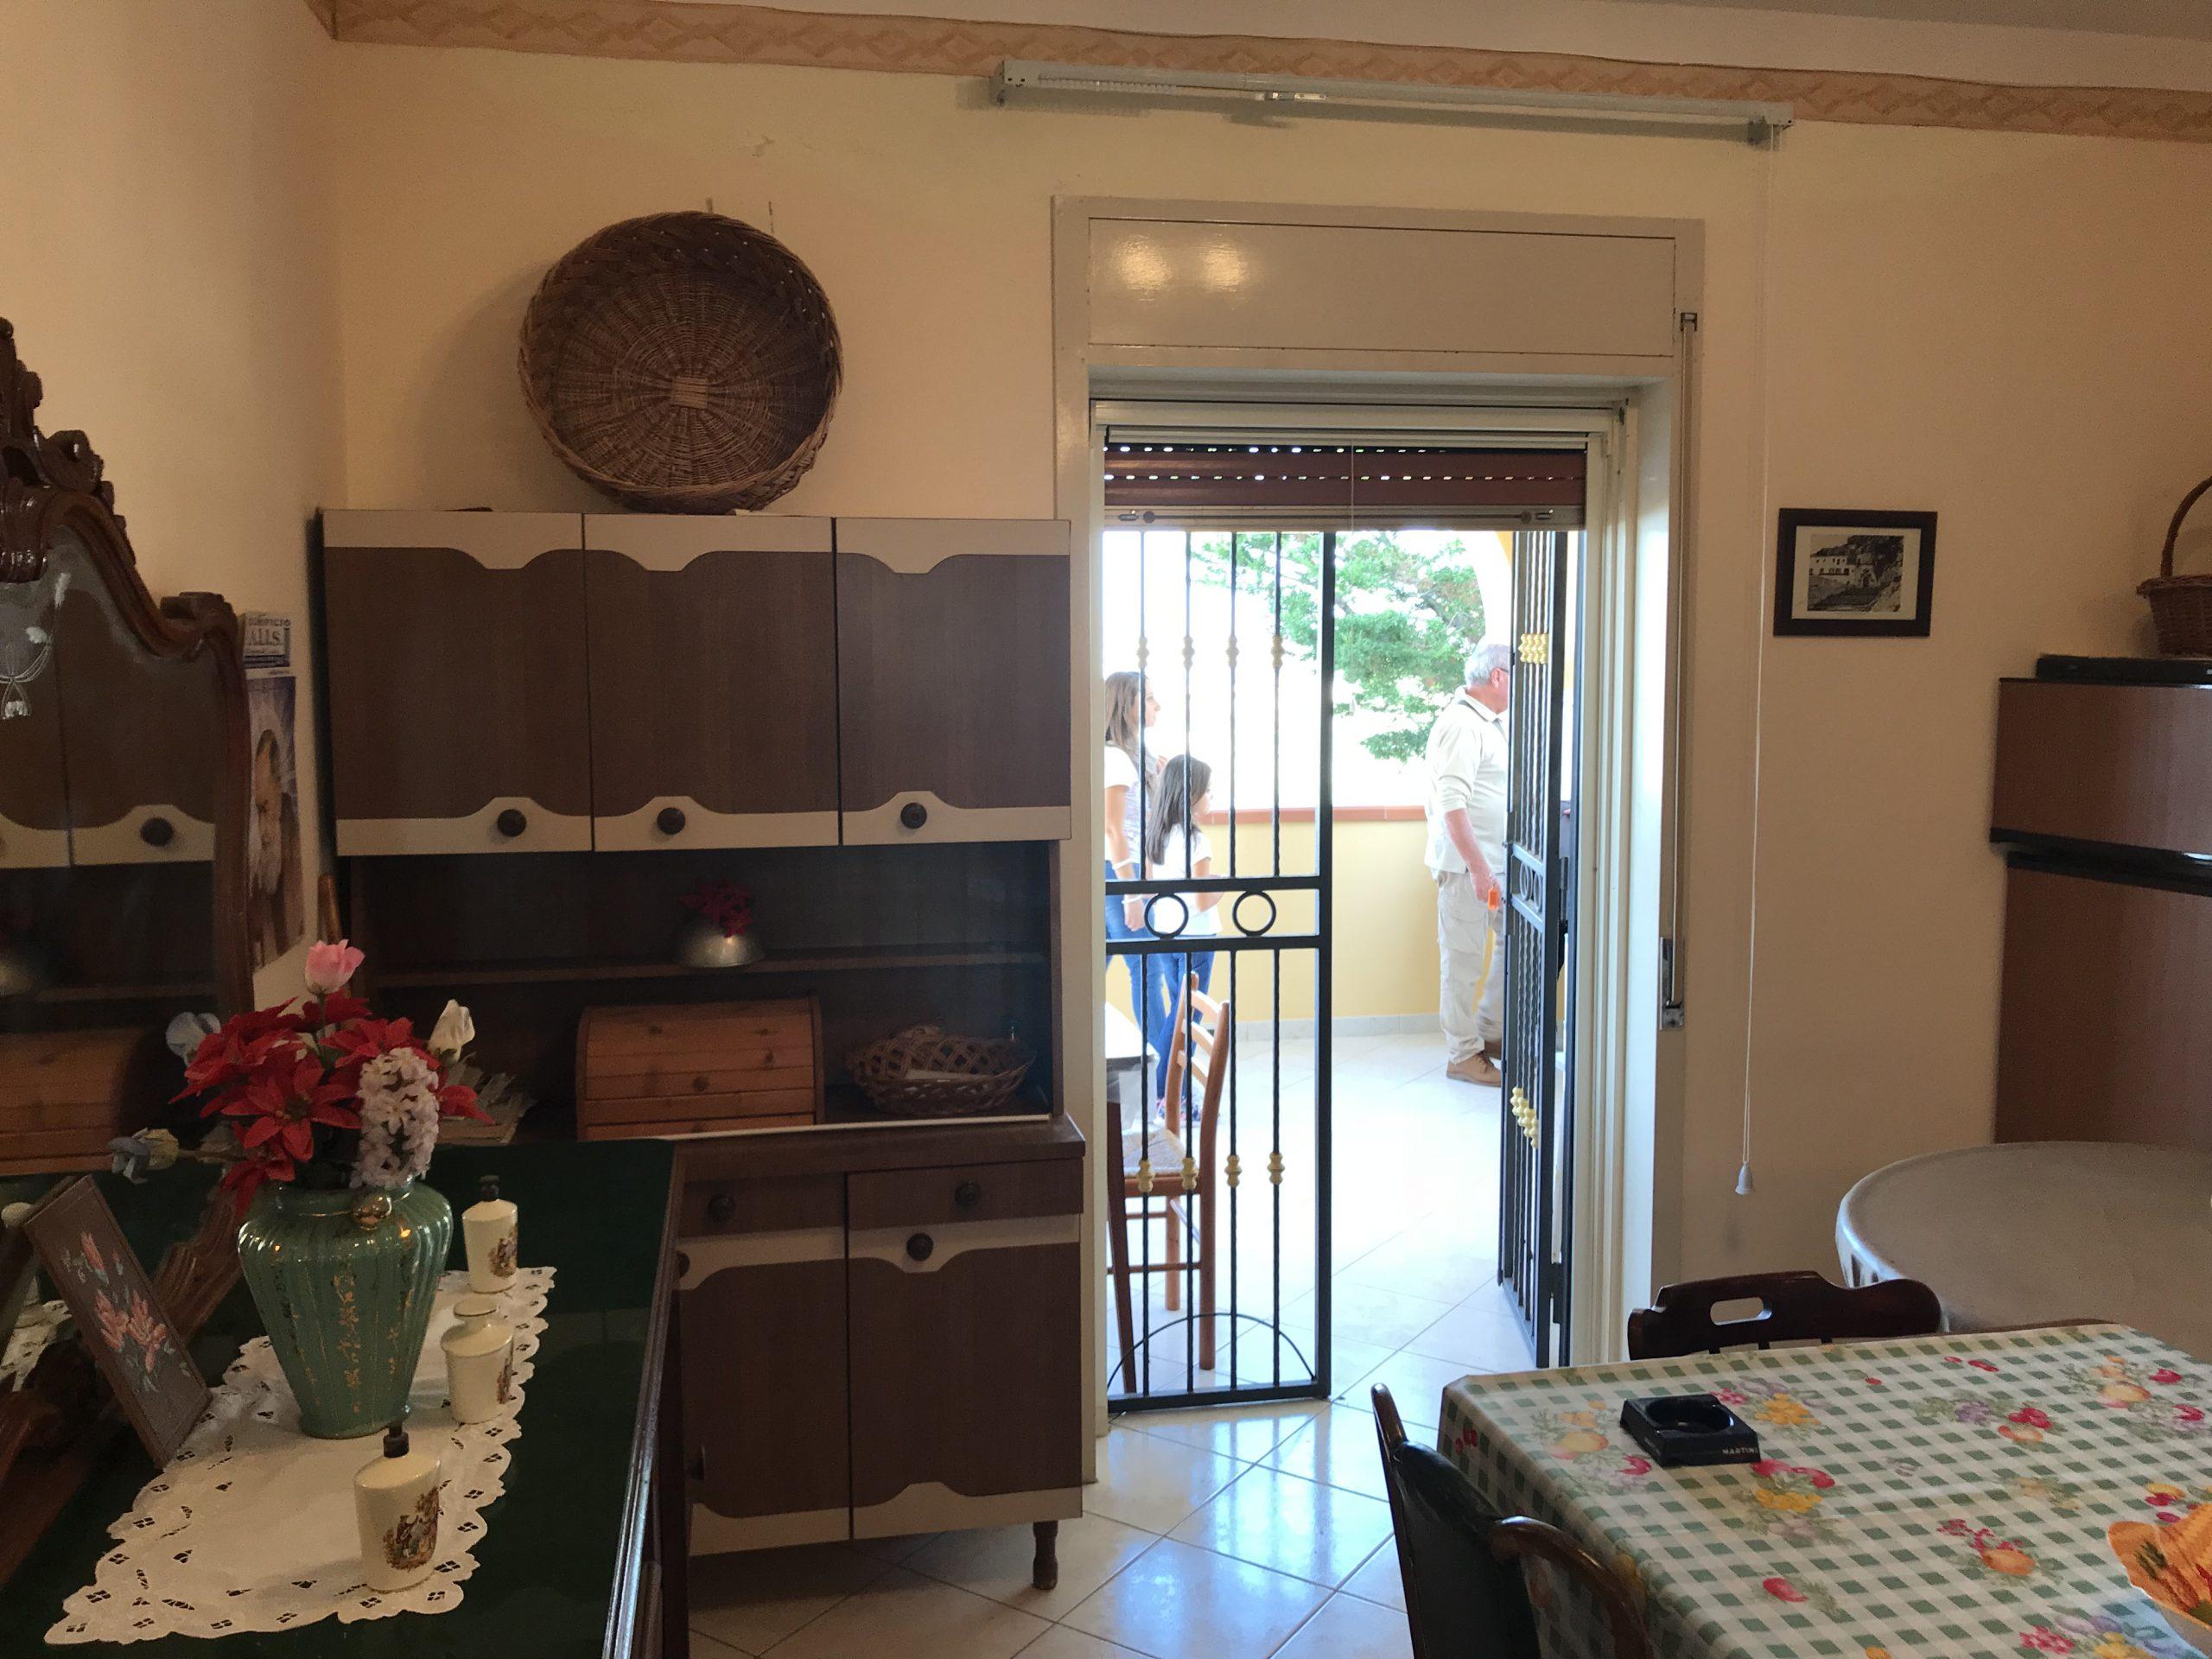 Casa in vendita in contrada Torre San Nicola s.n.c., Licata